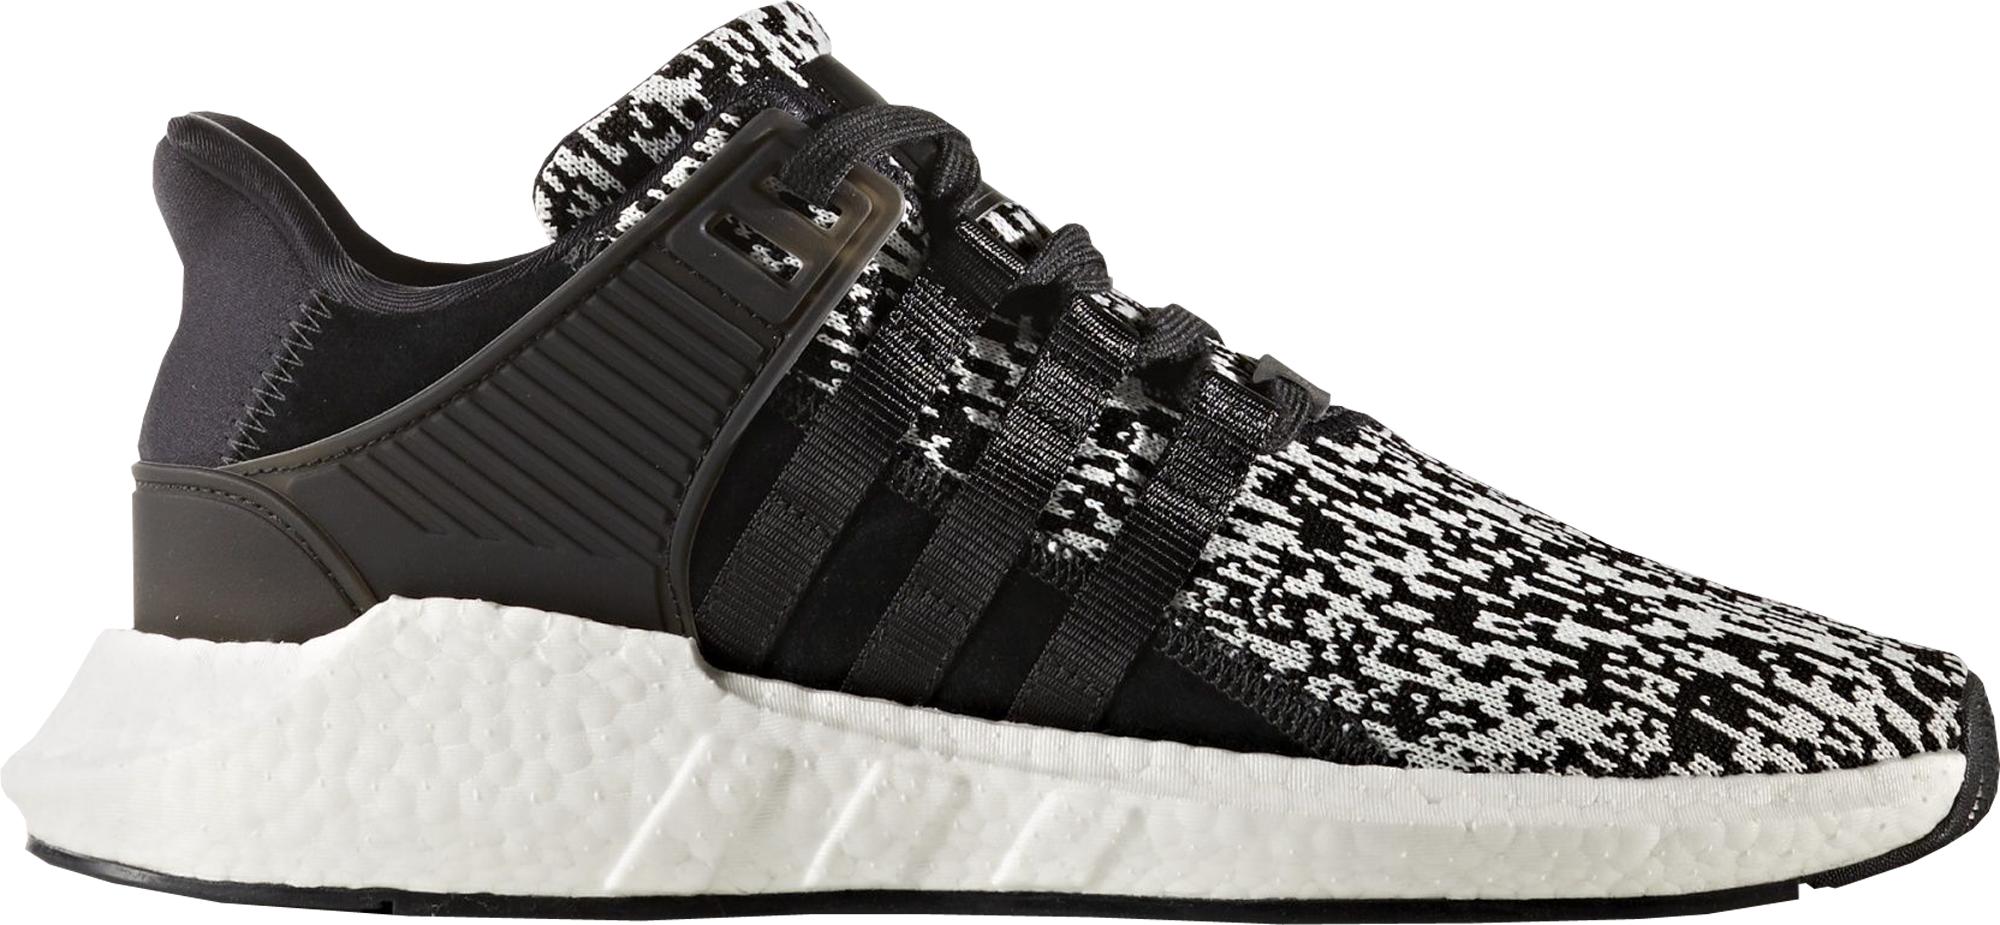 adidas EQT Support 93/17 Glitch Black White